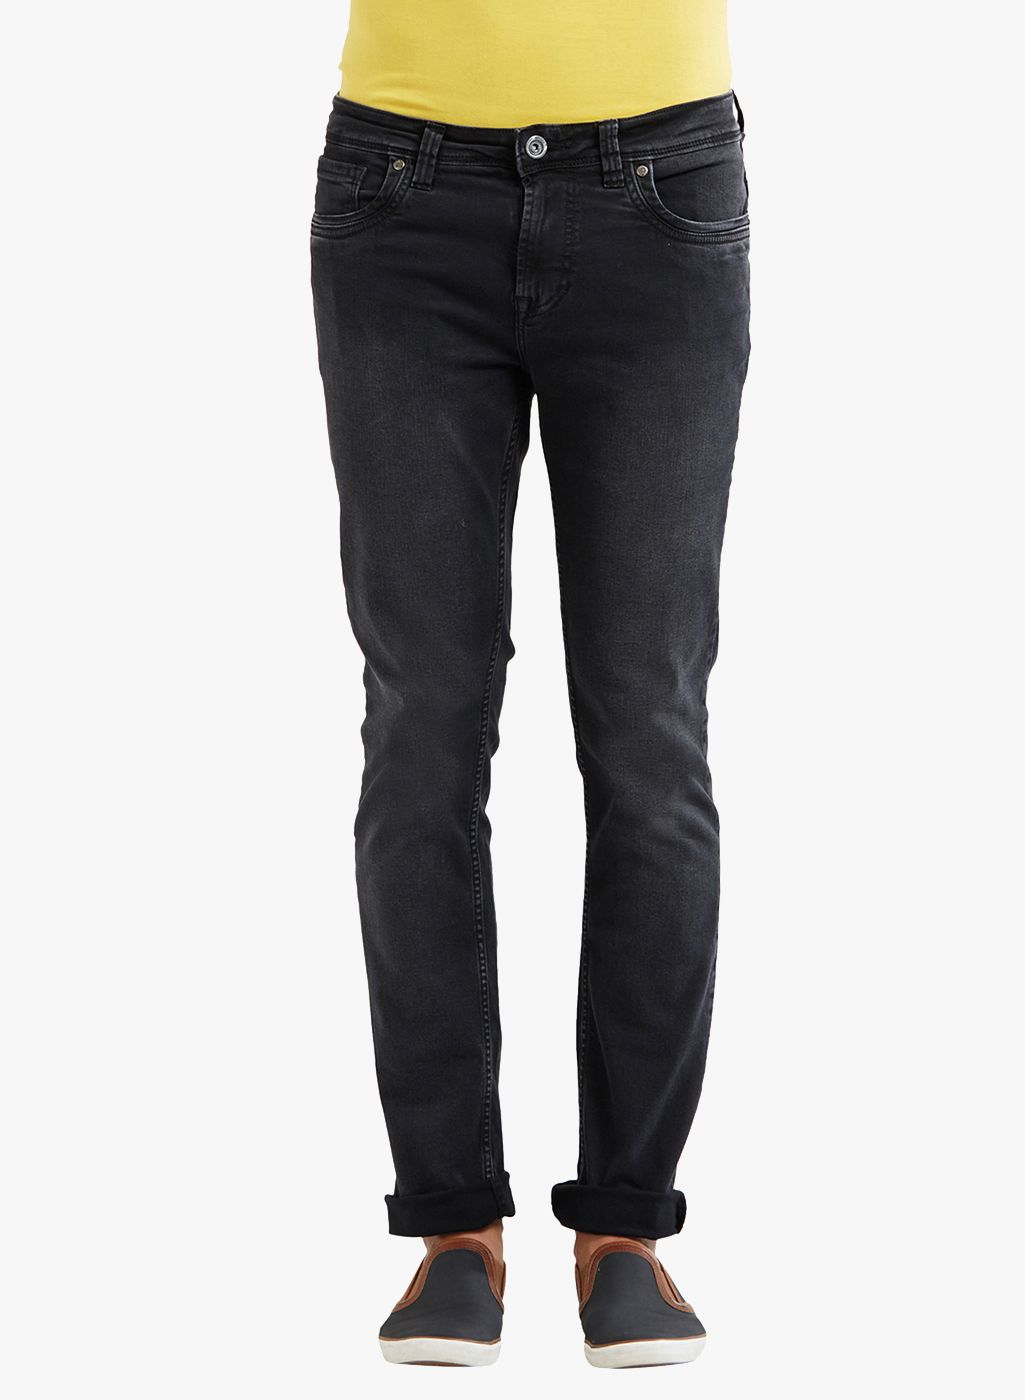 INTEGRITI Black Slim Jeans